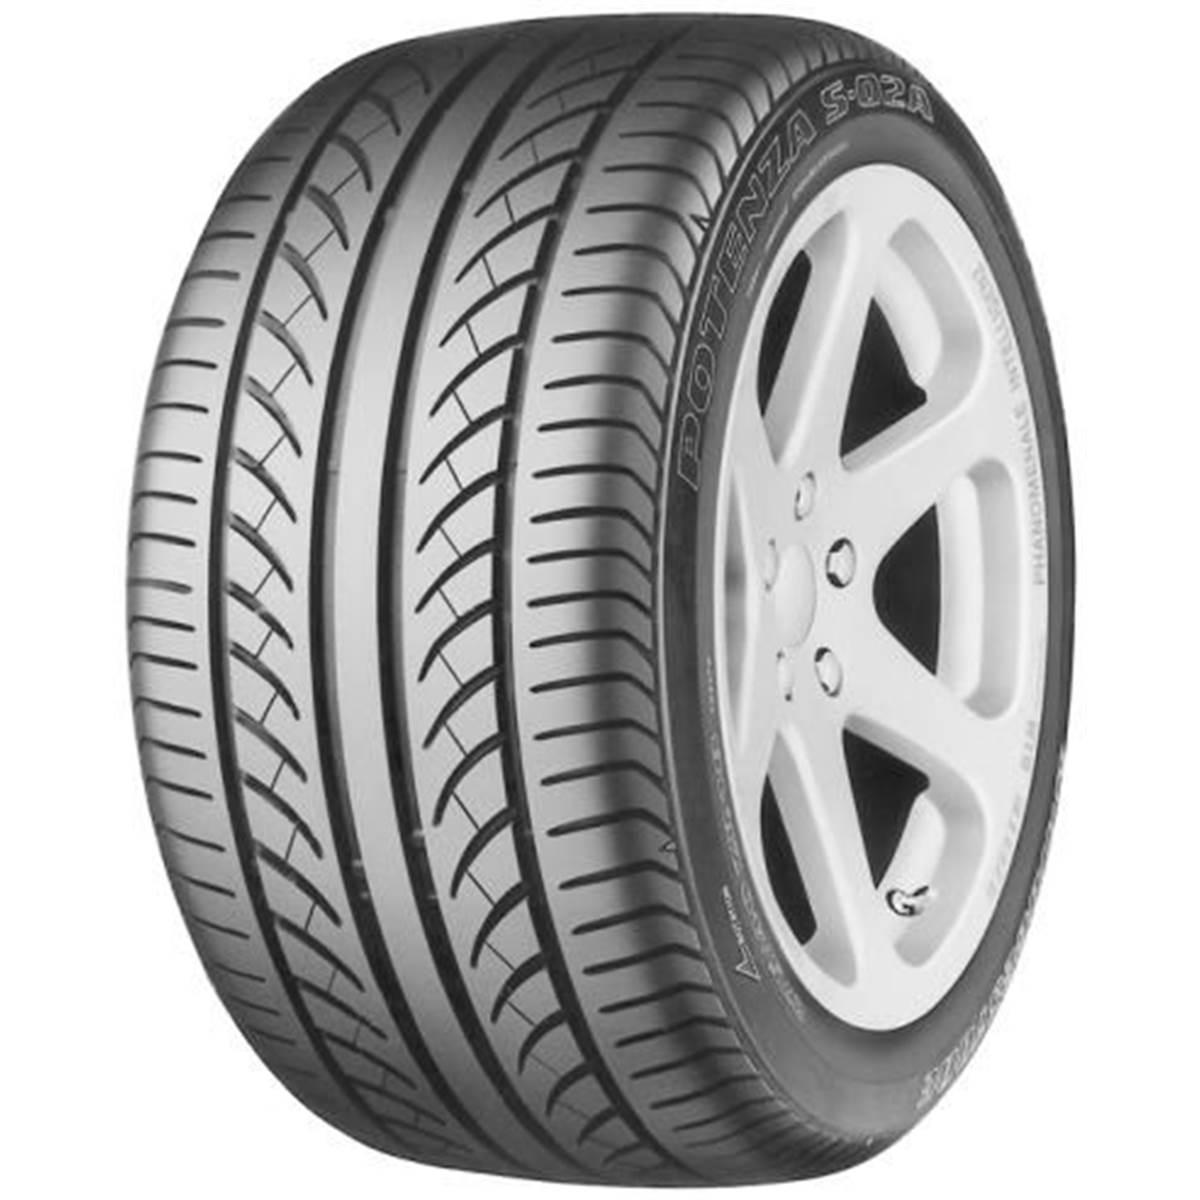 Pneu Bridgestone 265/35R18 Z Potenza S02A